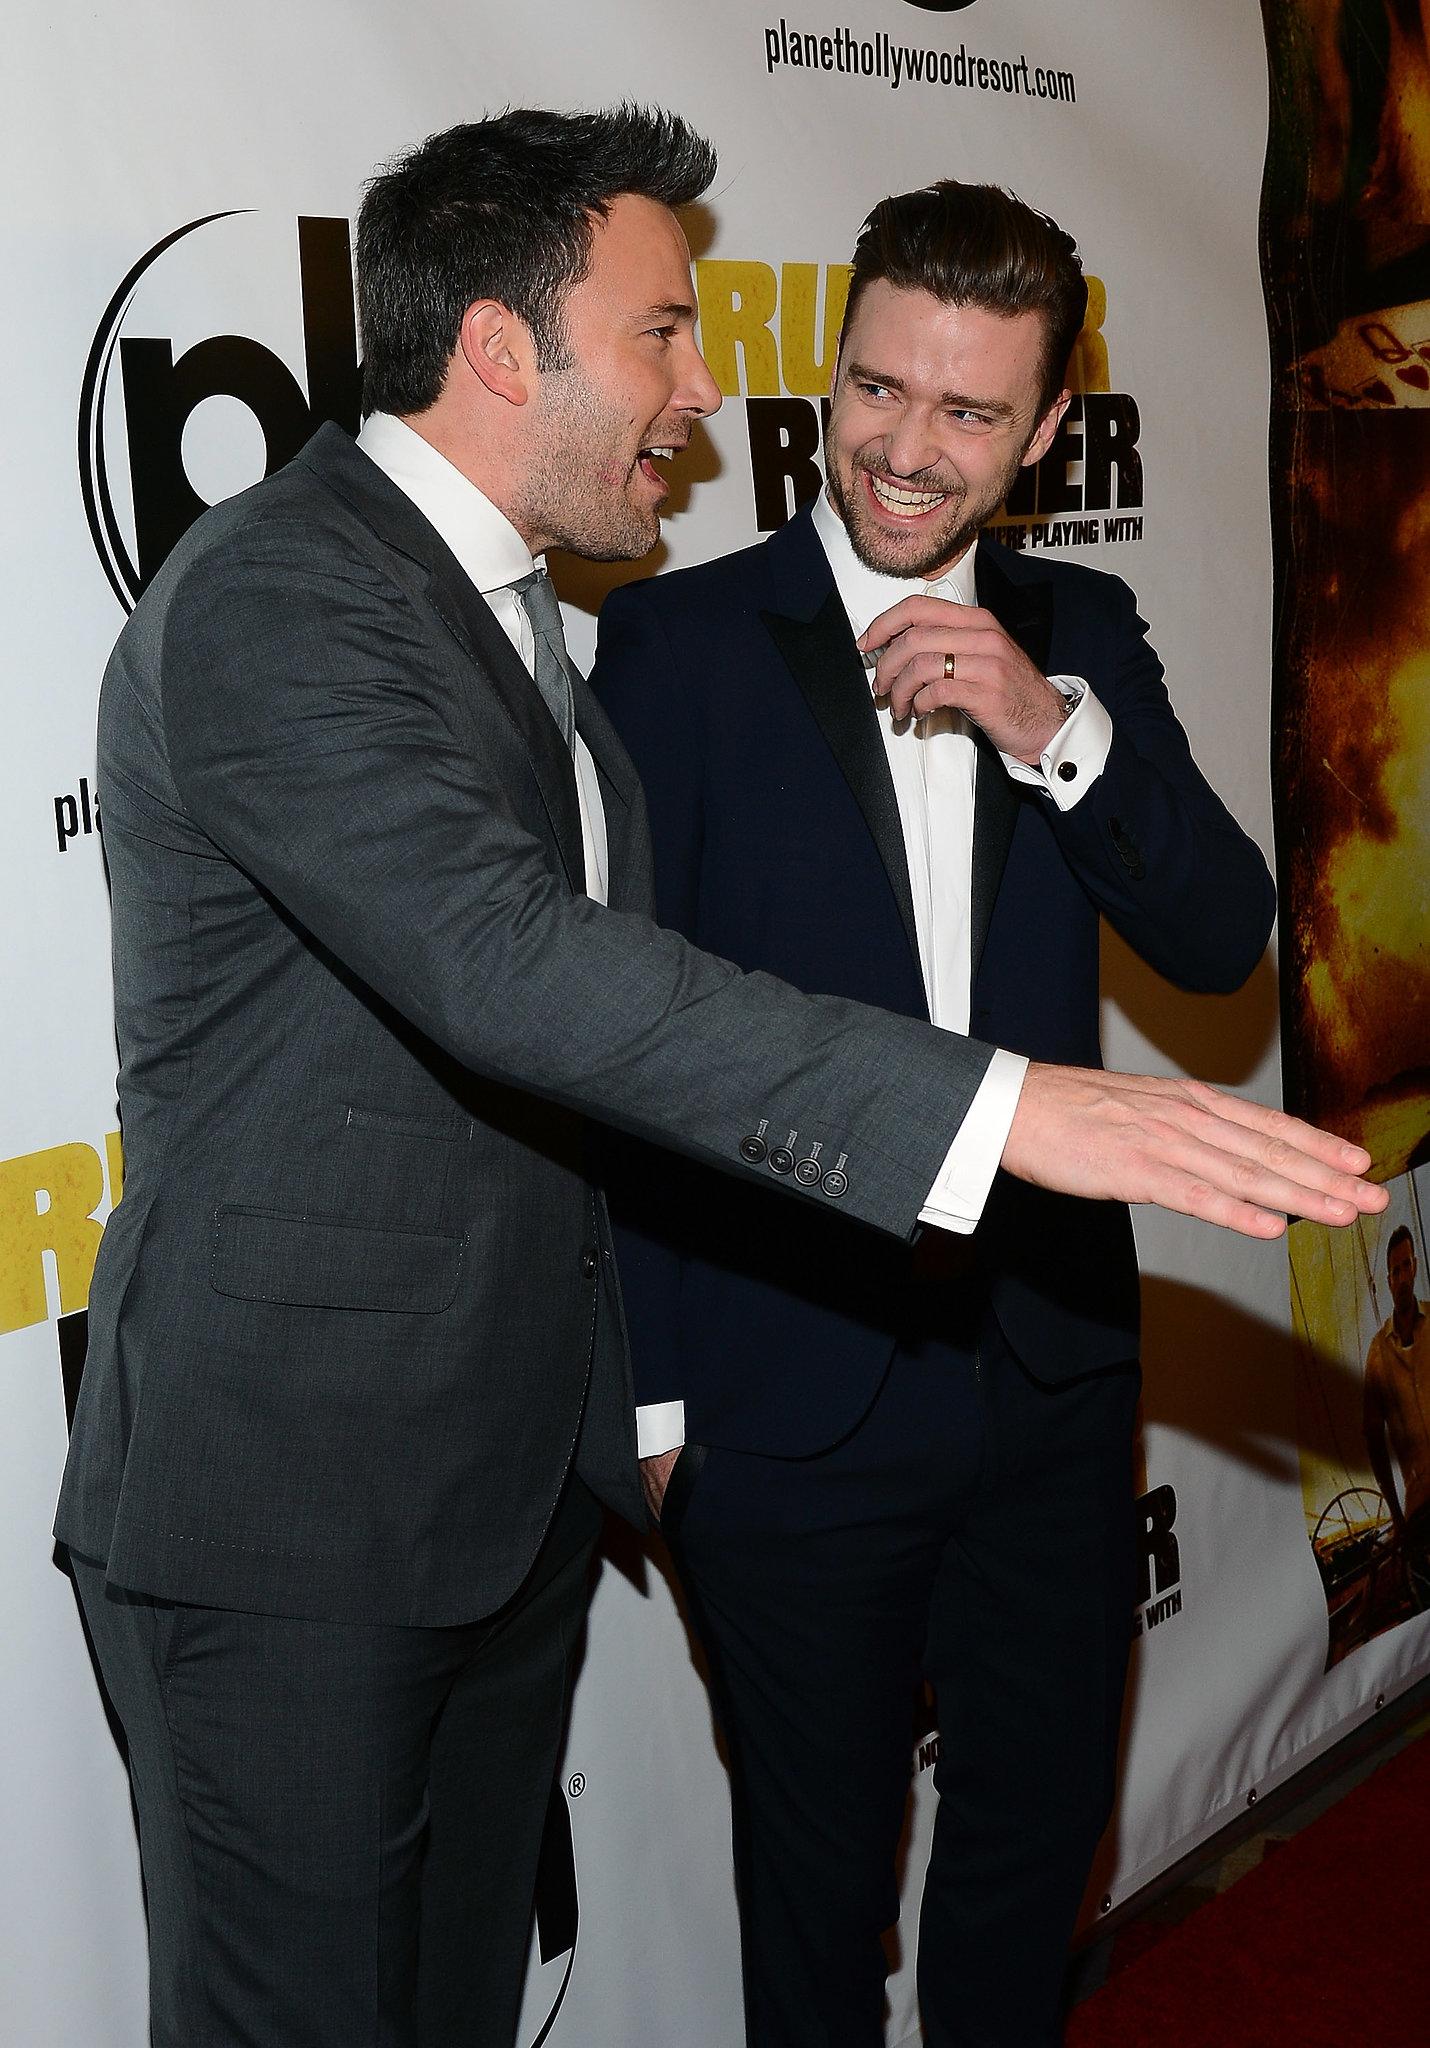 costar Ben Affleck at the film's Las Vegas premiere on Sept. 18